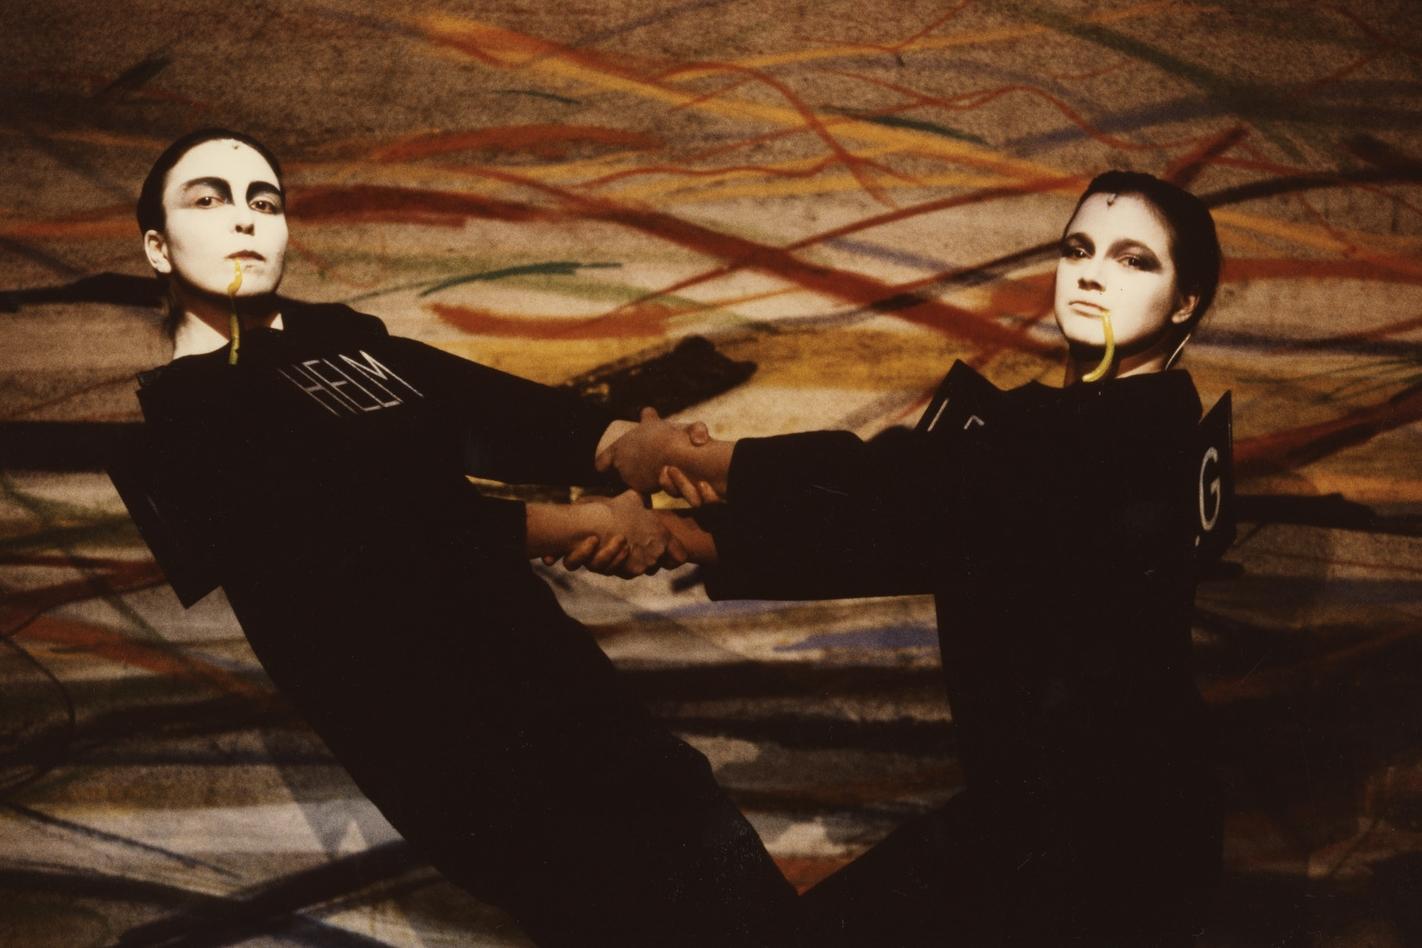 Monika Tahal and Susi Eisenkolb at the Thalia Theater, Hamburg, 1990